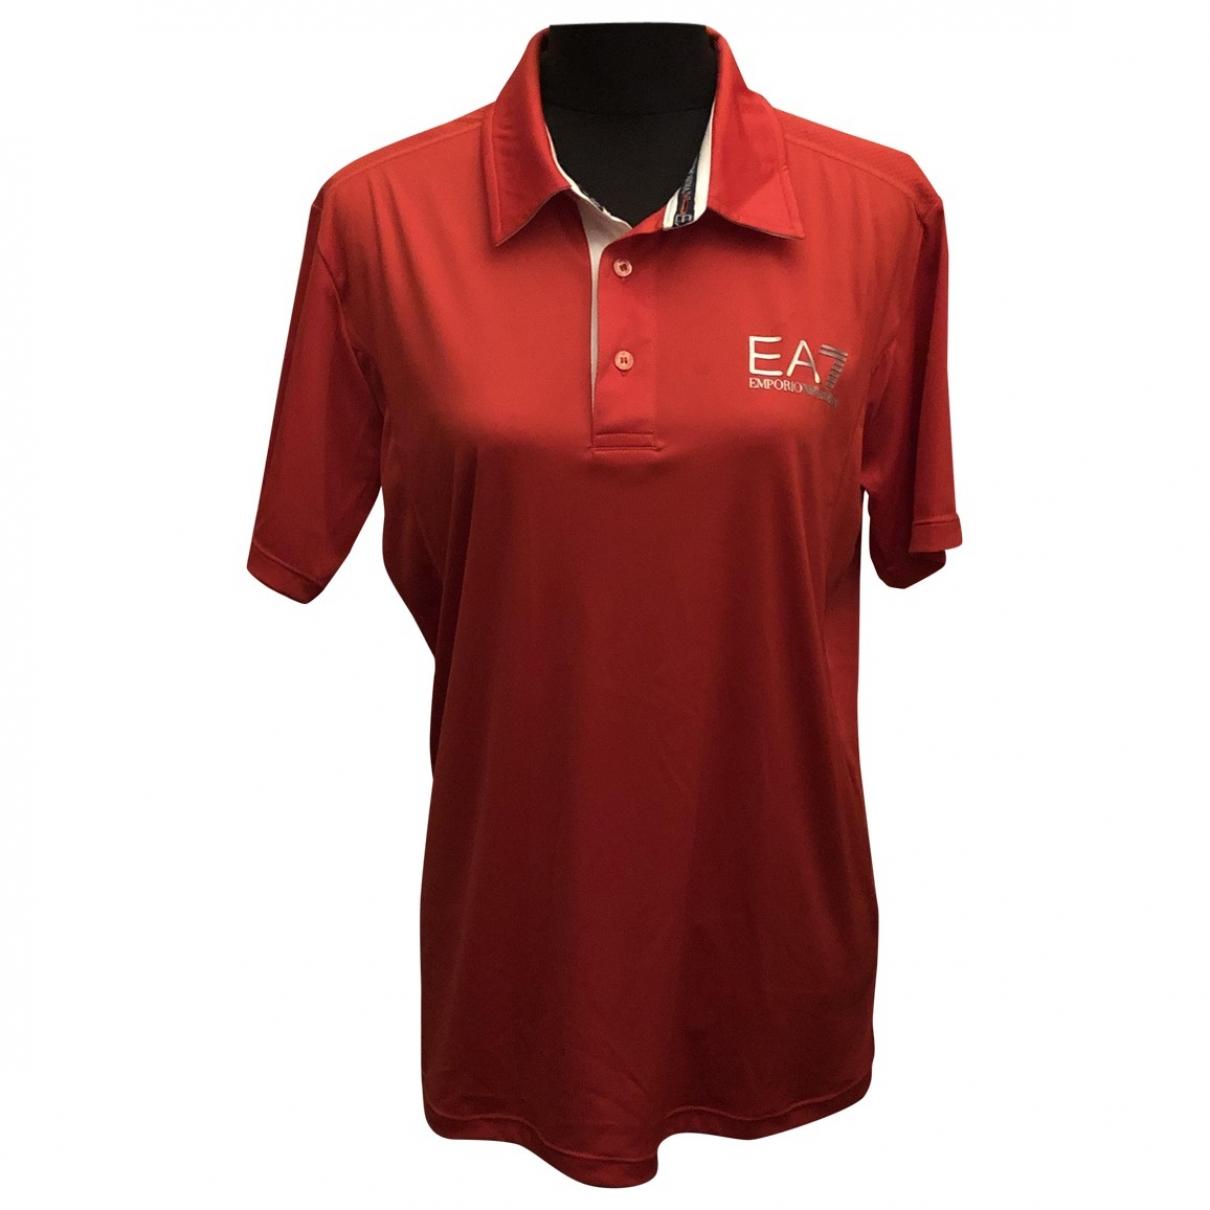 Emporio Armani \N Red Polo shirts for Men M International